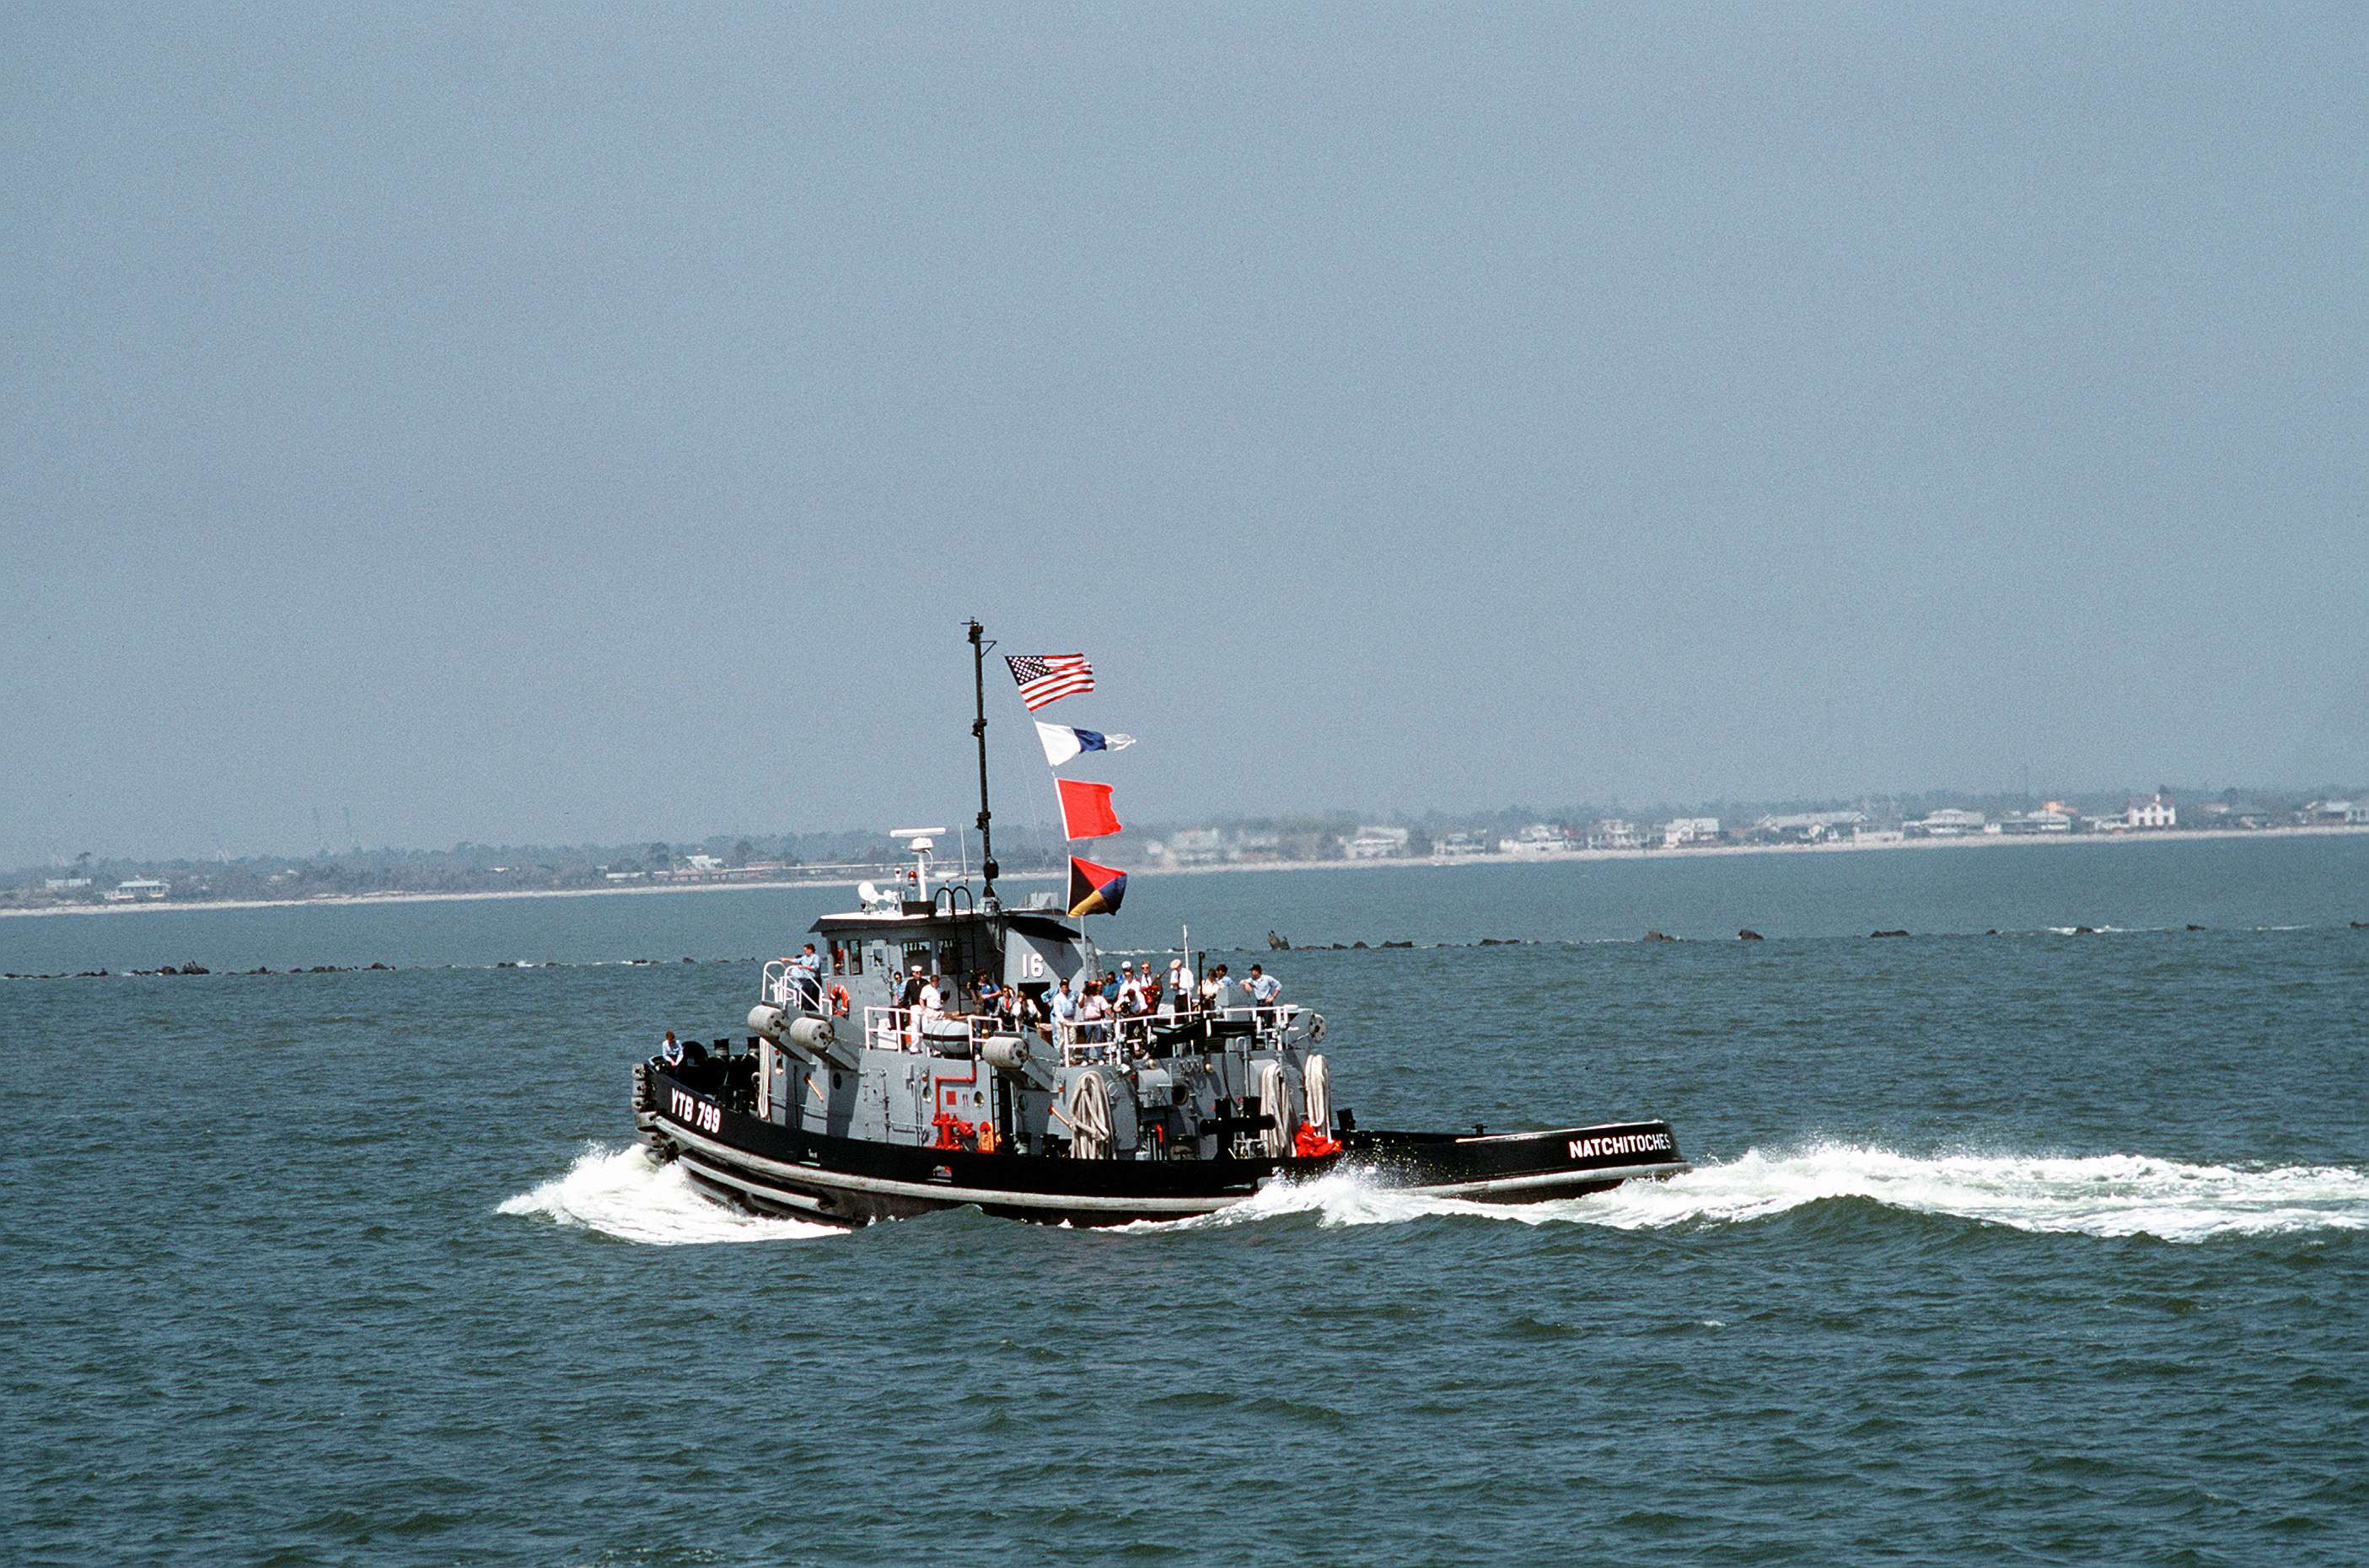 USS Natchitoches (YTB-799) | Military Wiki | FANDOM